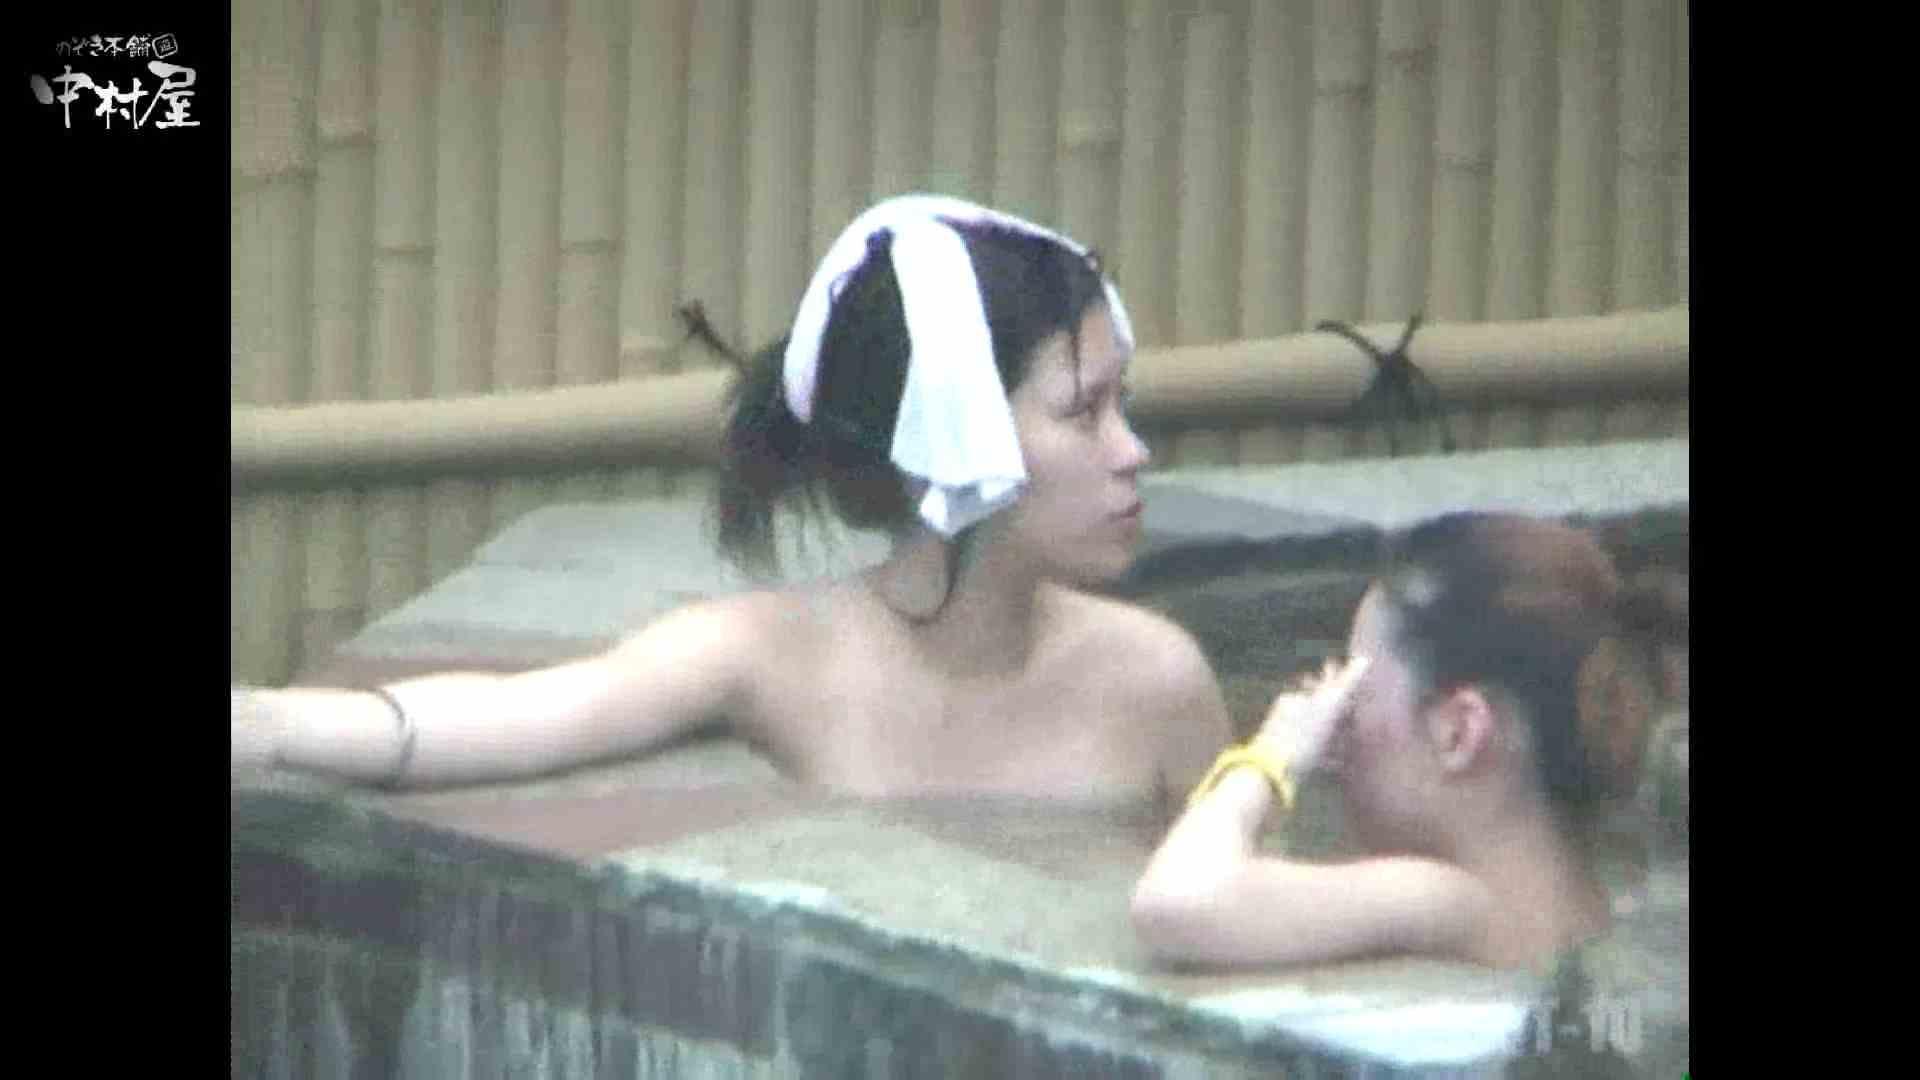 Aquaな露天風呂Vol.874潜入盗撮露天風呂十判湯 其の三 潜入突撃  77pic 76